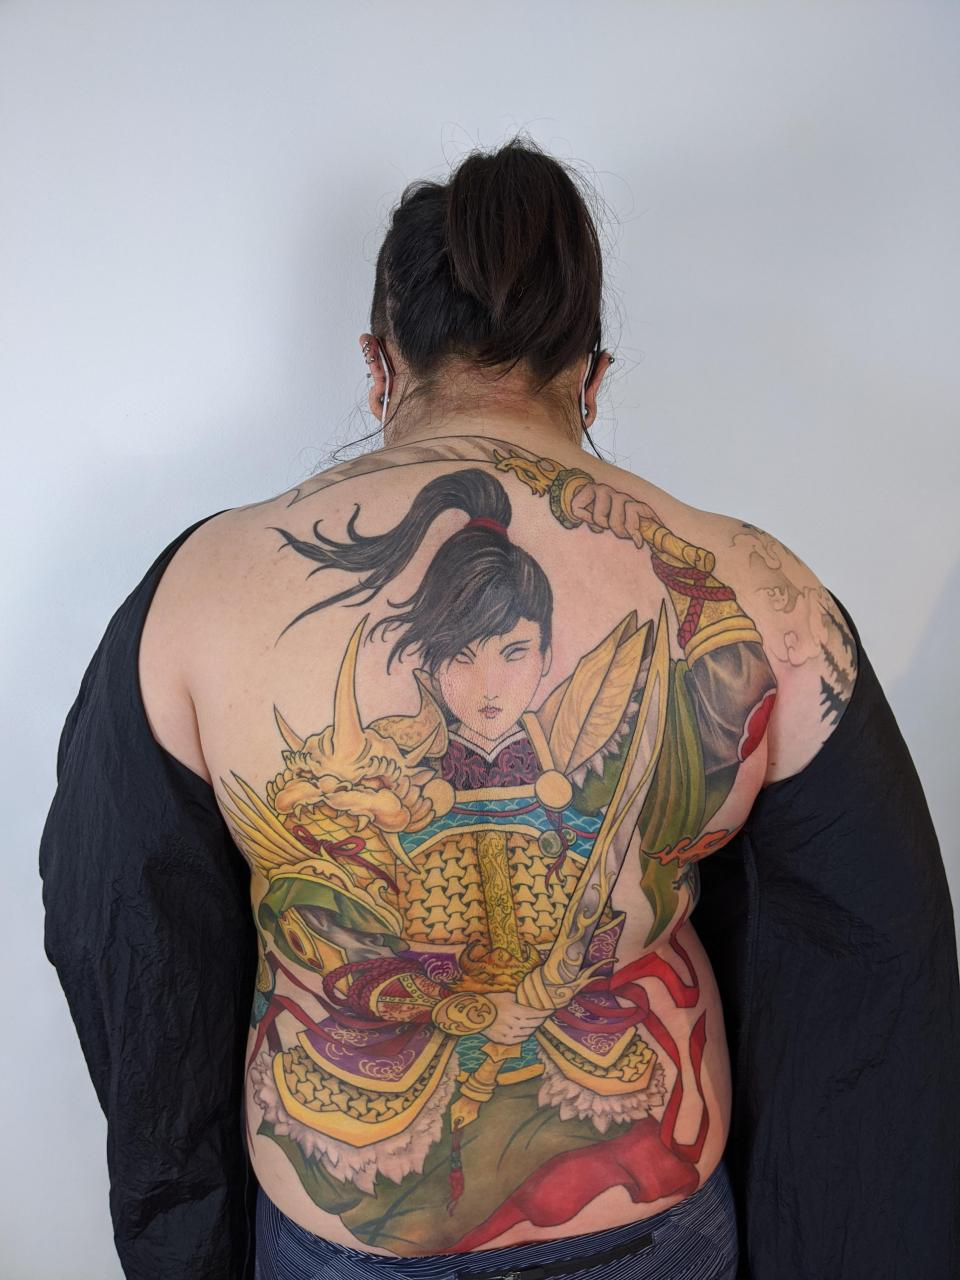 Warrior back piece by Marilyn Nguyen from Toronto, Canada (@marilyn_tattoos)